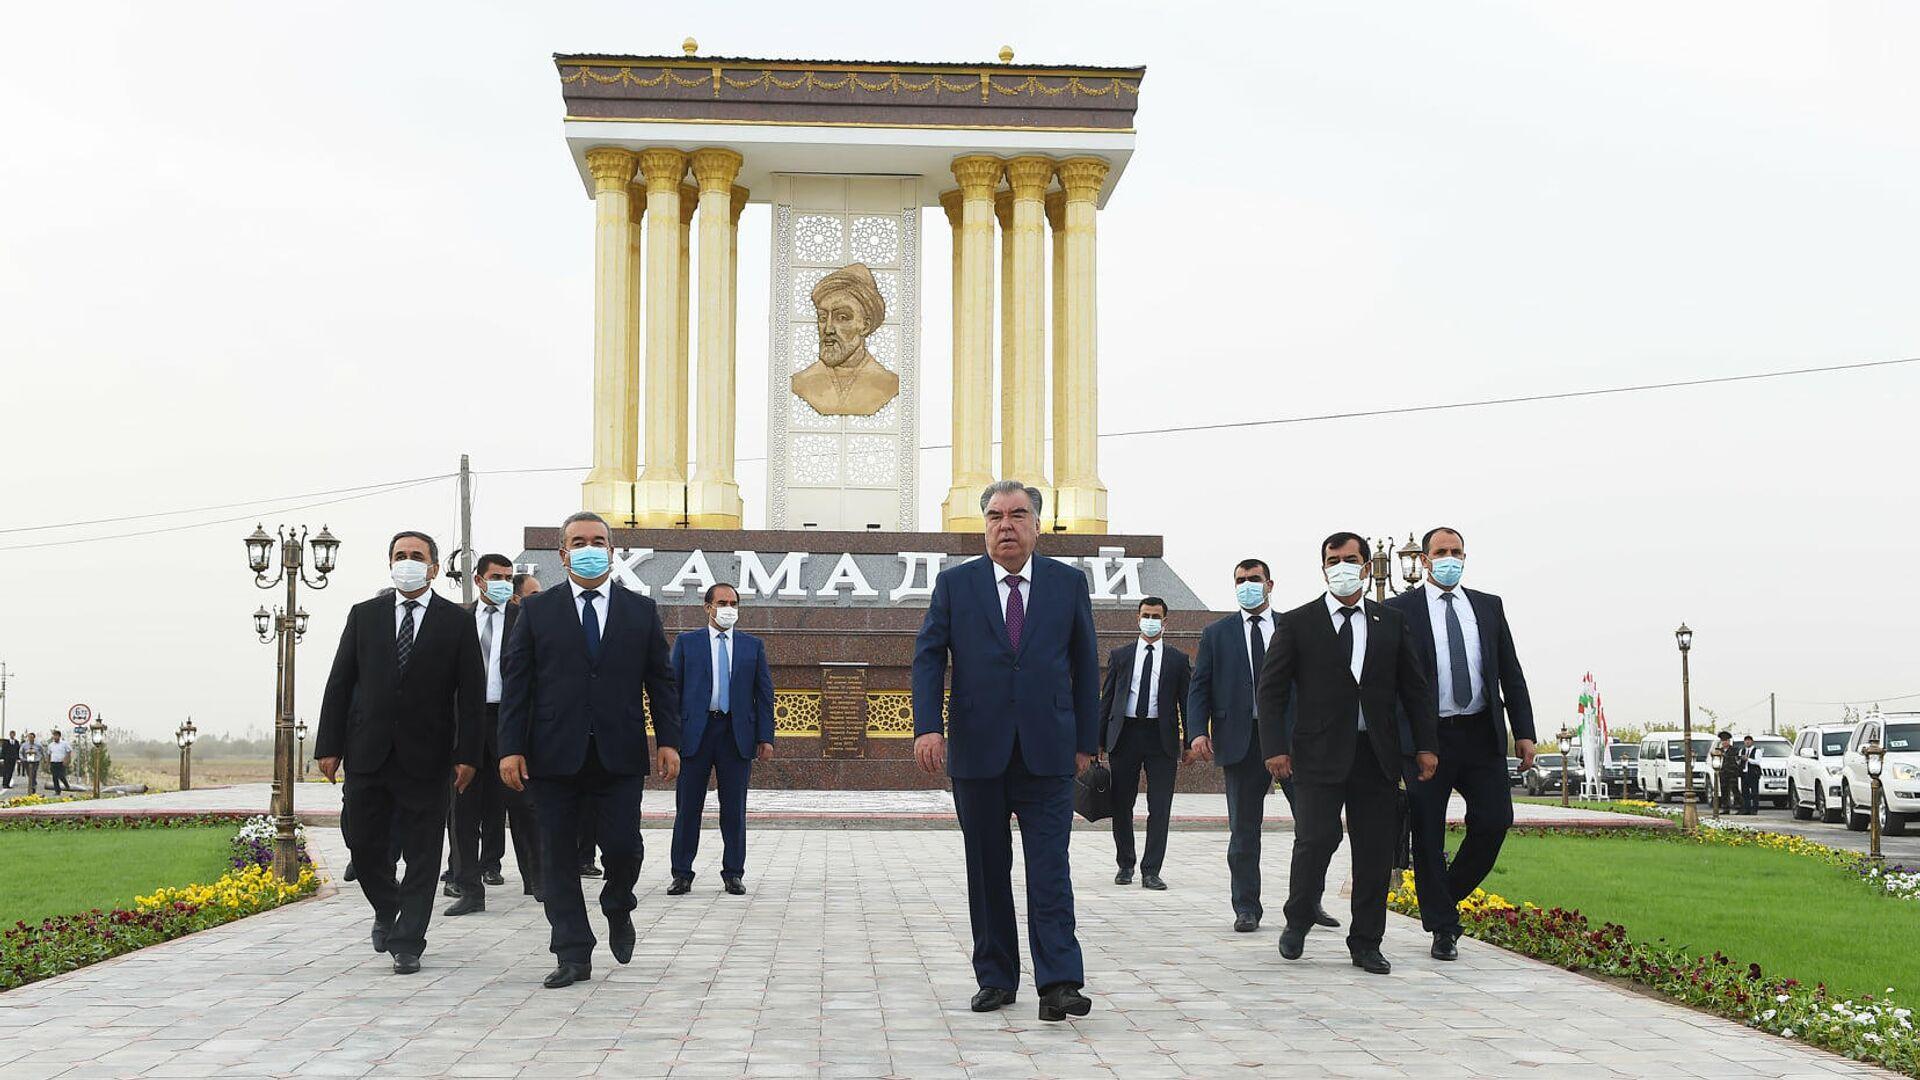 Президент Республики Таджикистан Эмомали Рахмон - Sputnik Тоҷикистон, 1920, 01.10.2021